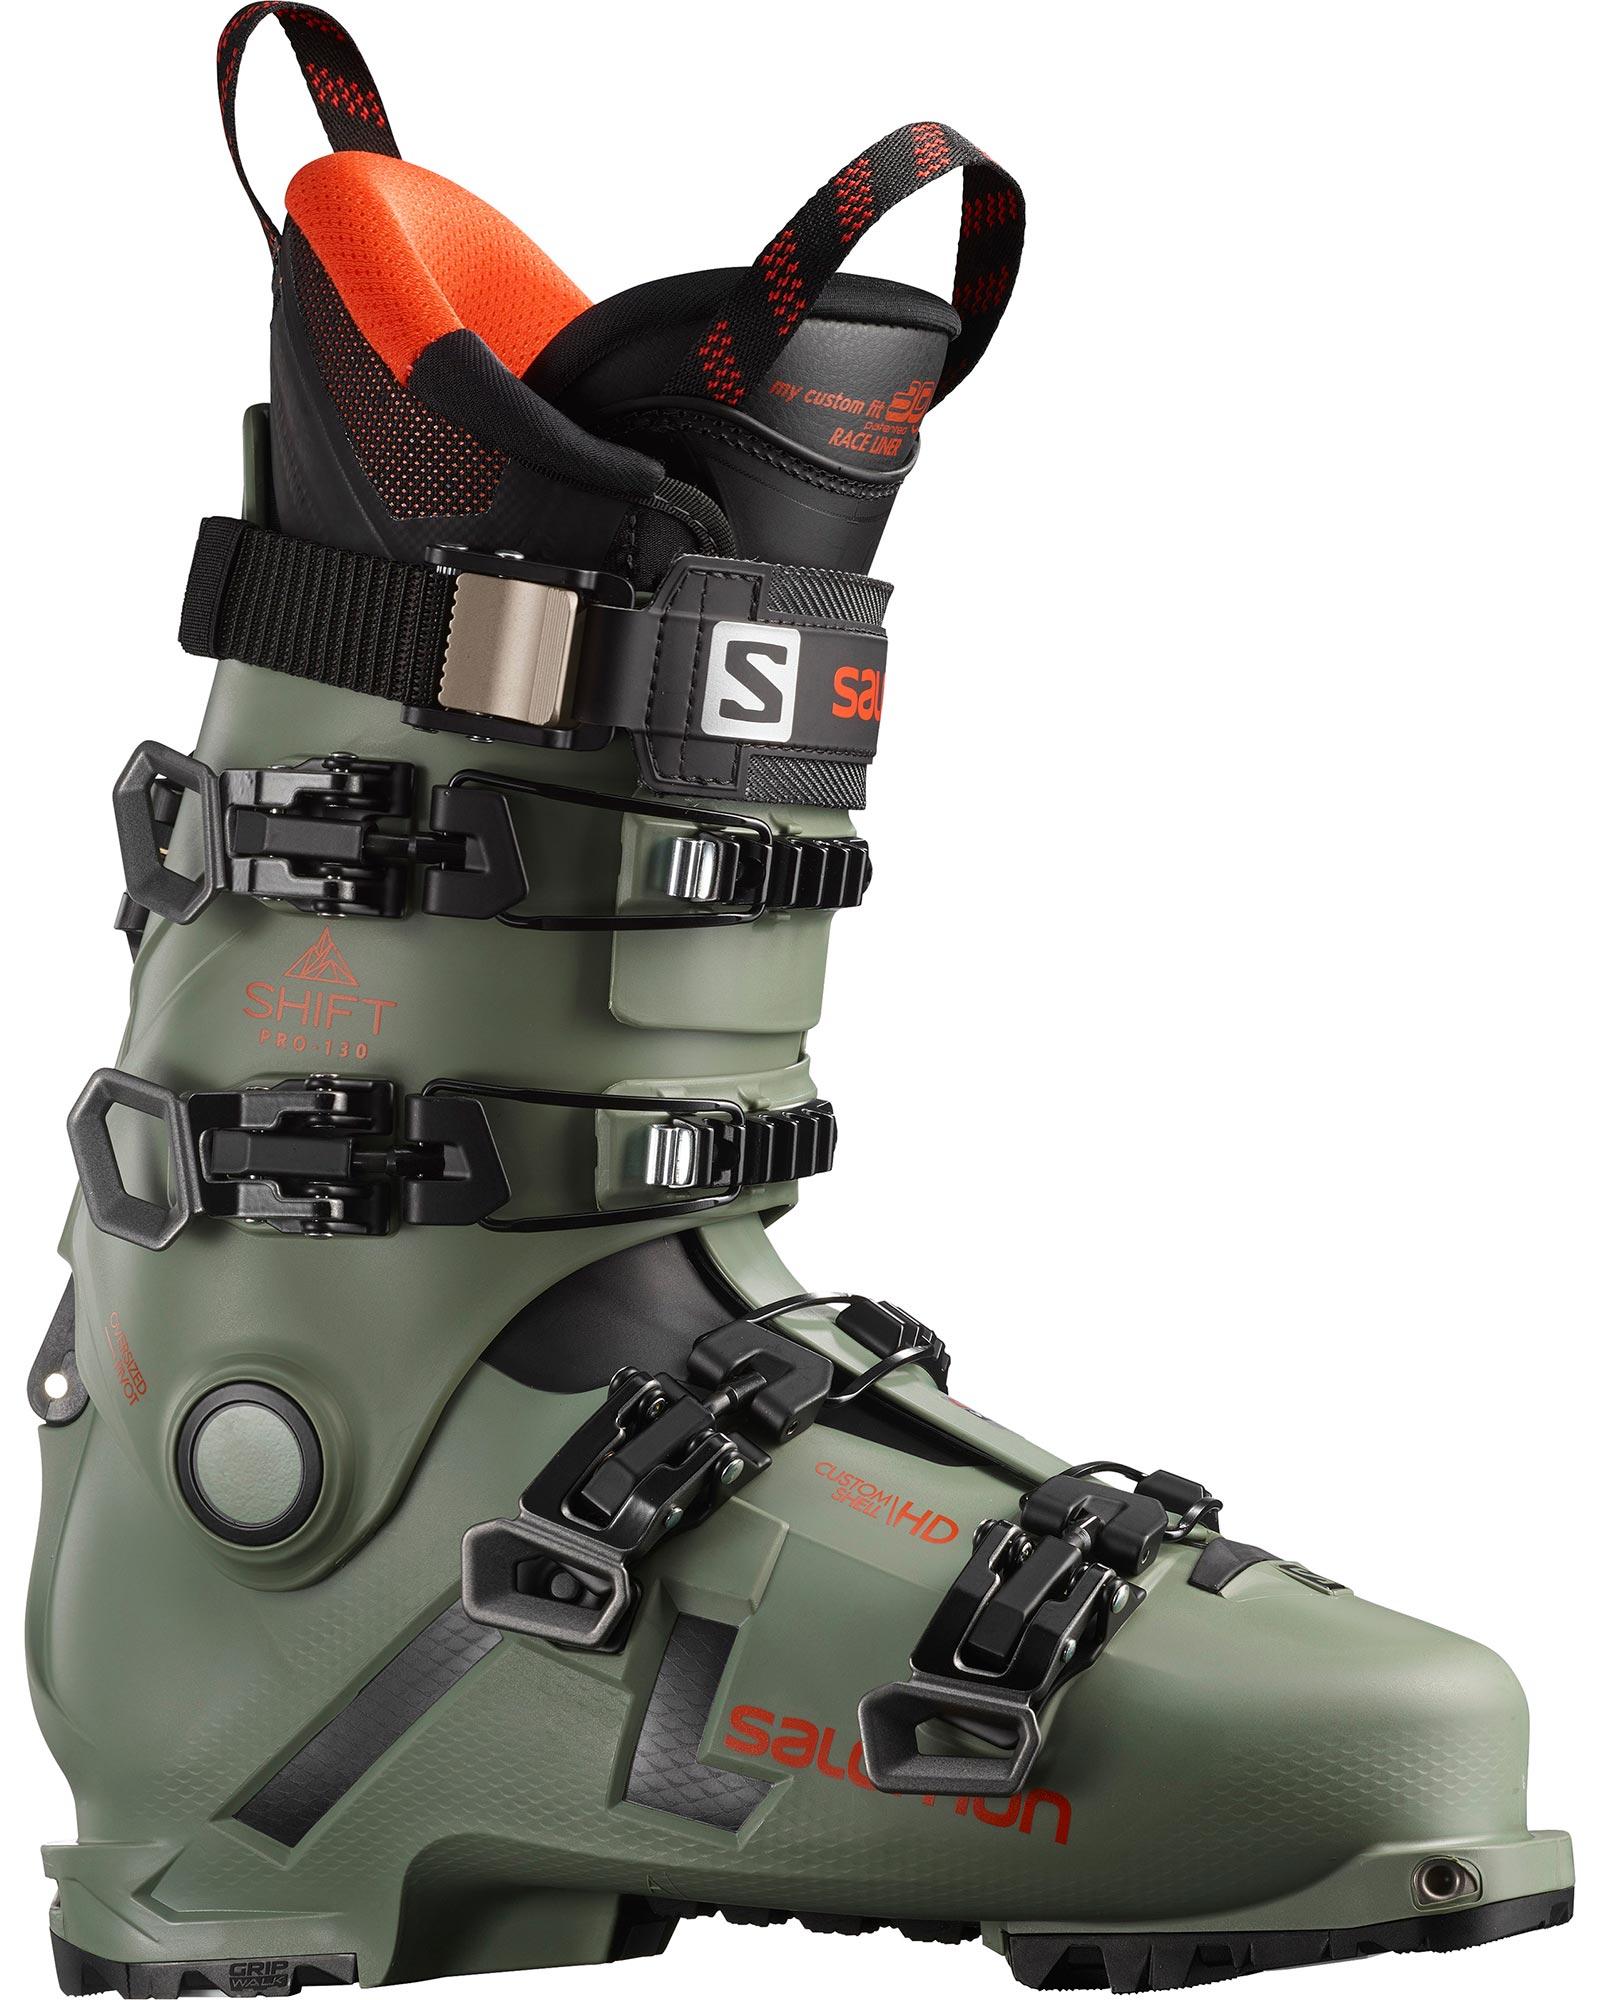 Salomon Men's Shift Pro 130 AT Backcountry Ski Boots 2020 / 2021 0